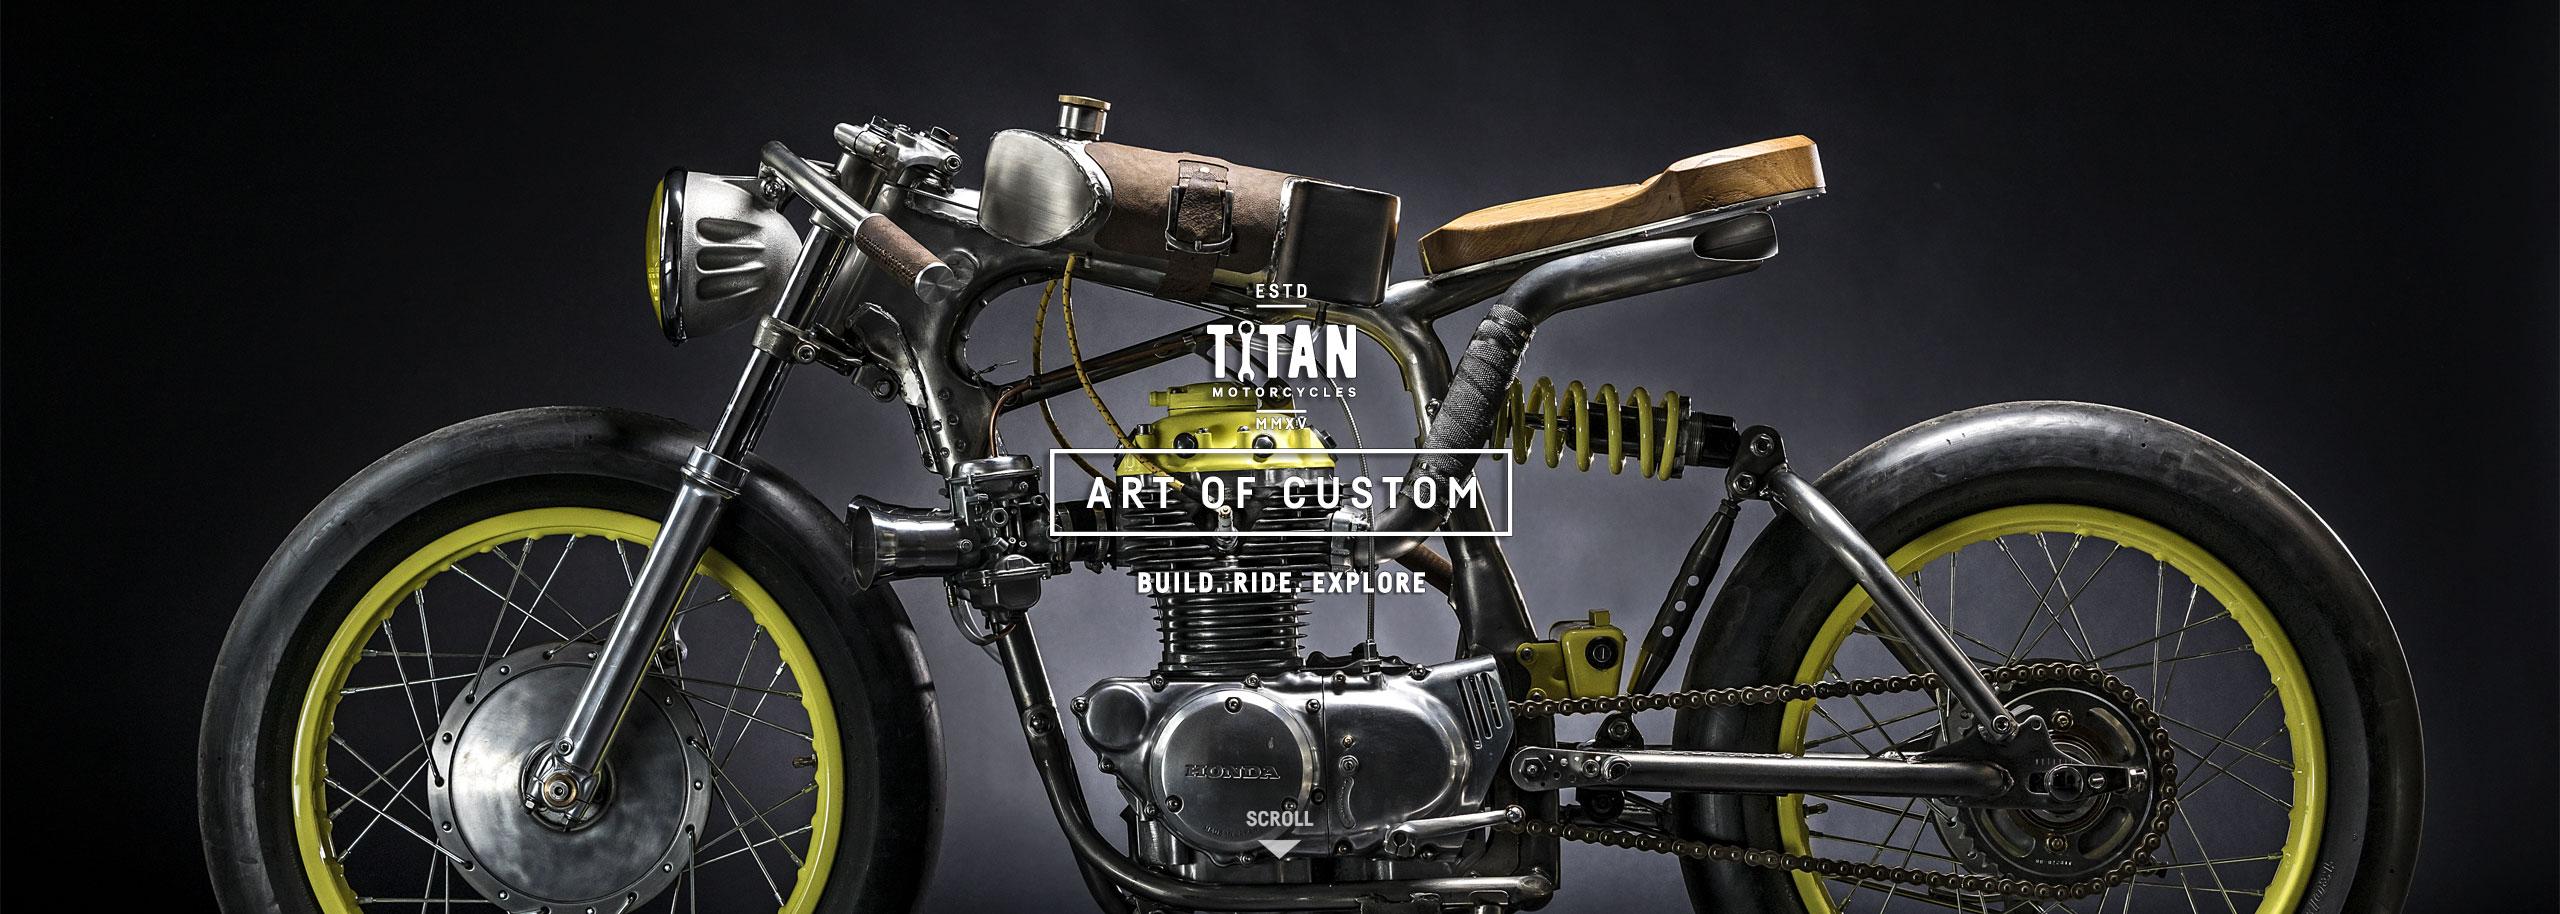 Titan-One_Alte-Maschinen-Custom-Cafe-Racer-Graz-Reduktion-Design-Zulassung-Typisiert-TÜV_Bike-Styira-Oldtimer-Konzept-Honda-Umbau_staatsmeister-Viertelmeile-Rennen